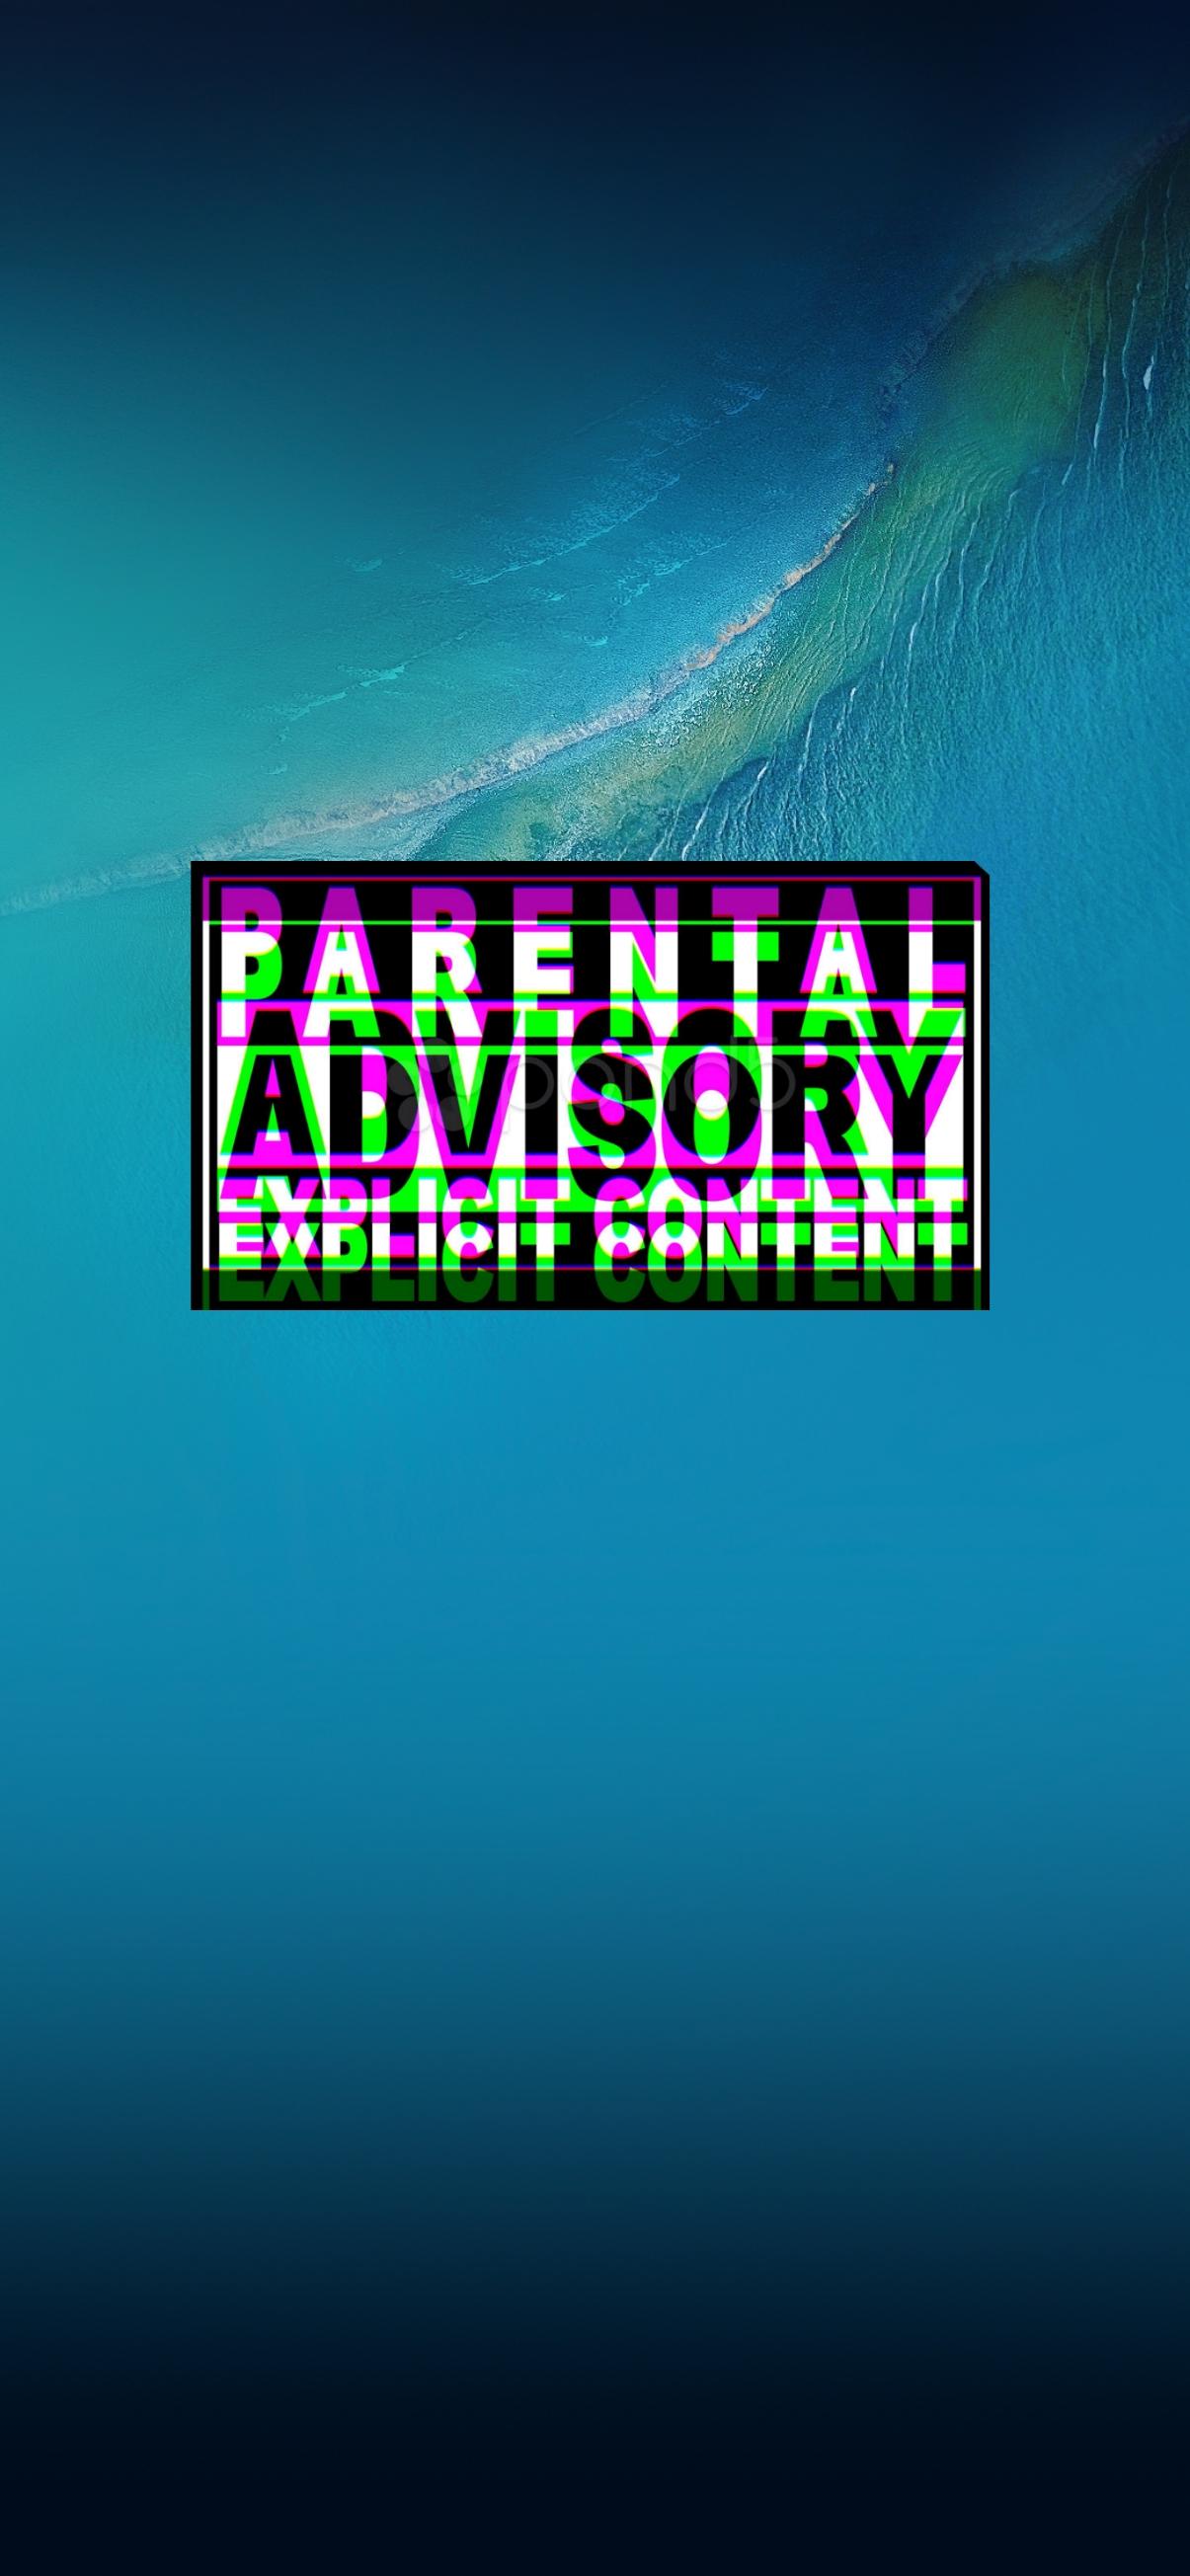 parental advisory wallpaper iphone